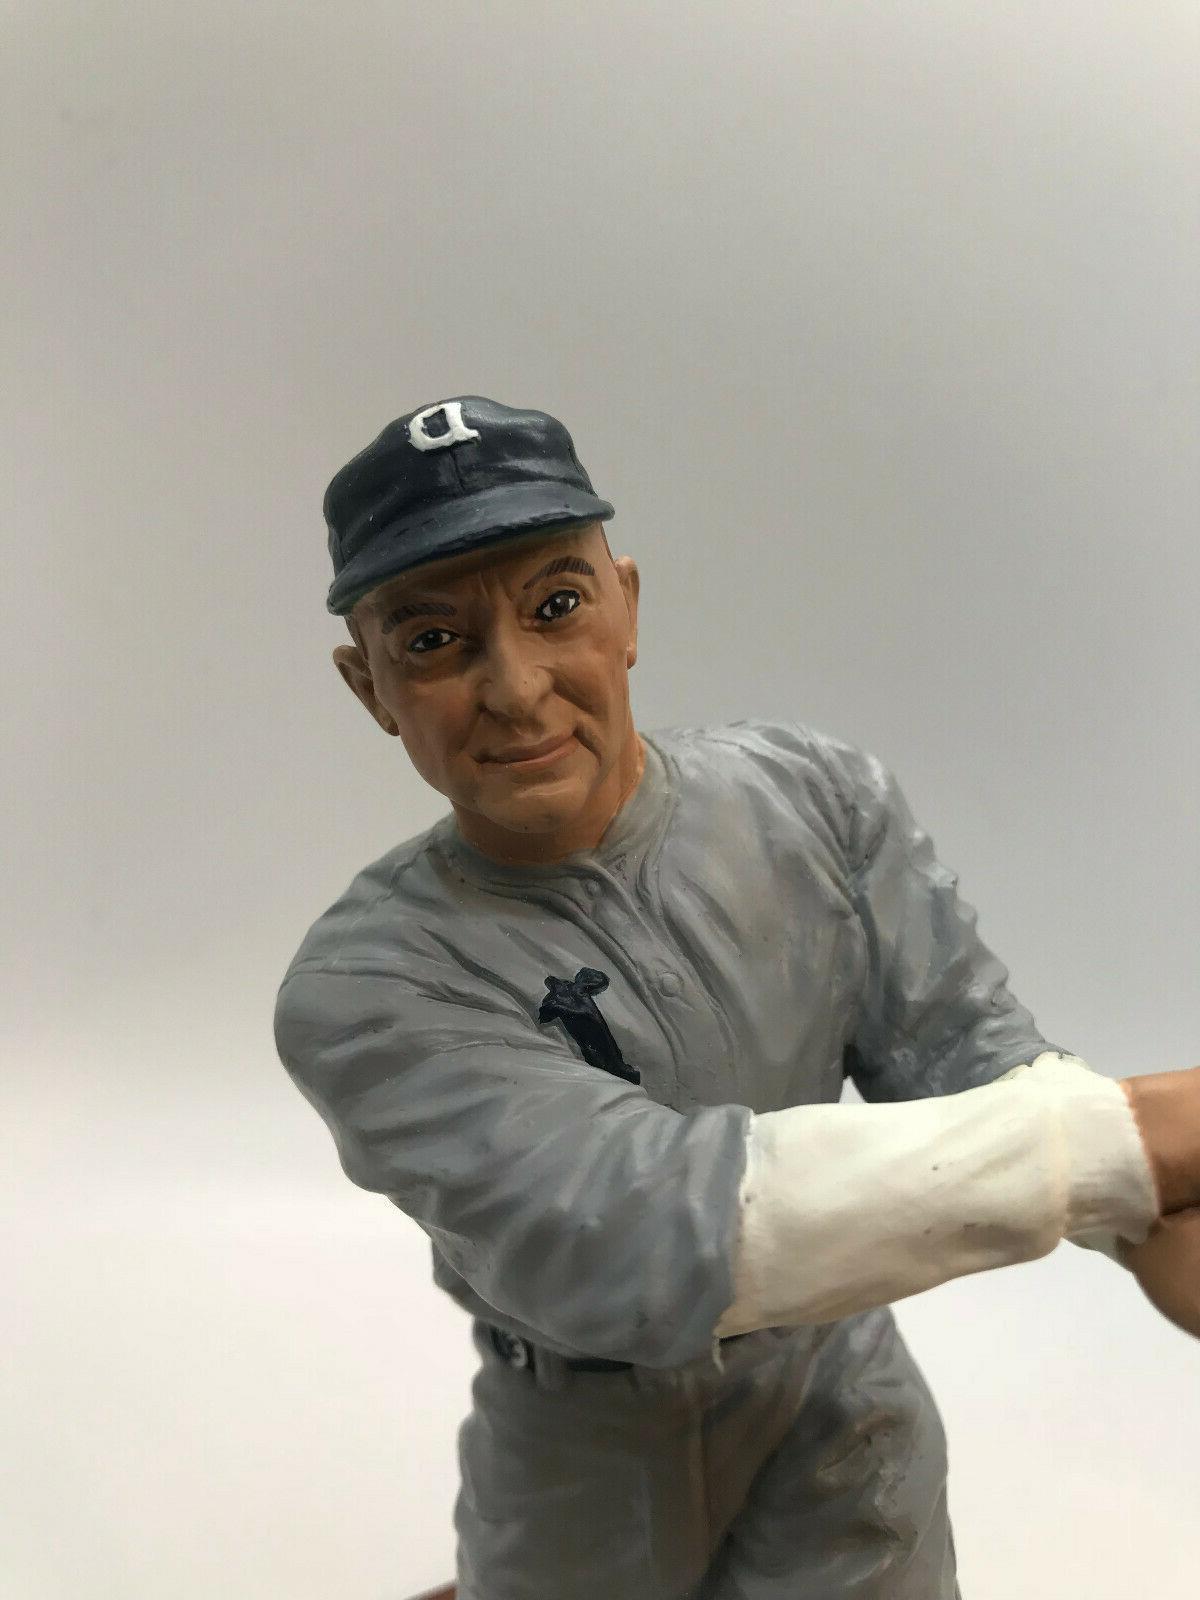 Salvino Series Cobb Detroit Tigers Figure